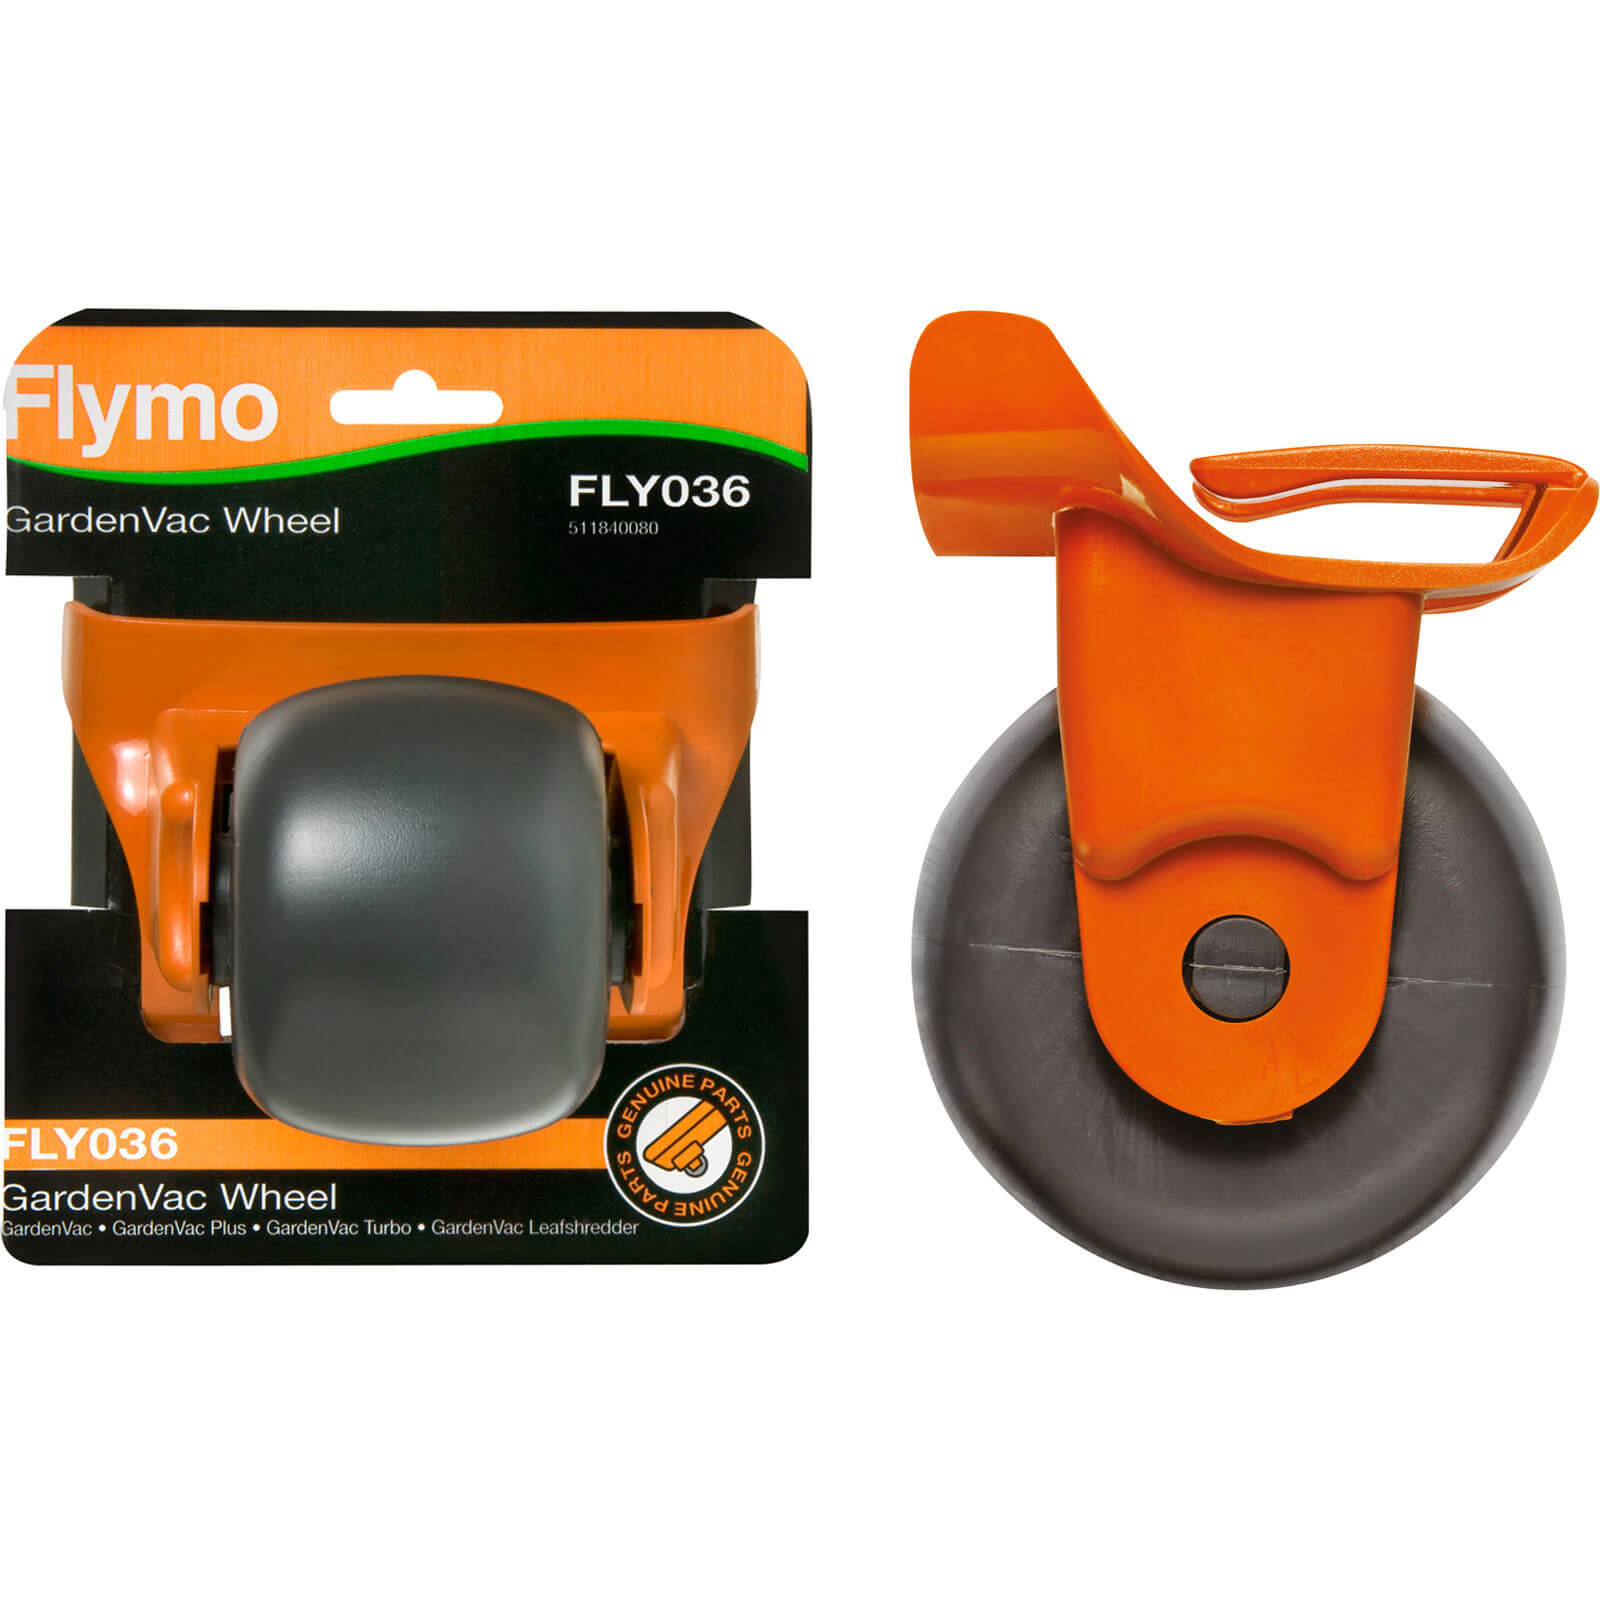 Flymo FLY036 Replacement Gardenvac Wheel for All Flymo Garden Vacs